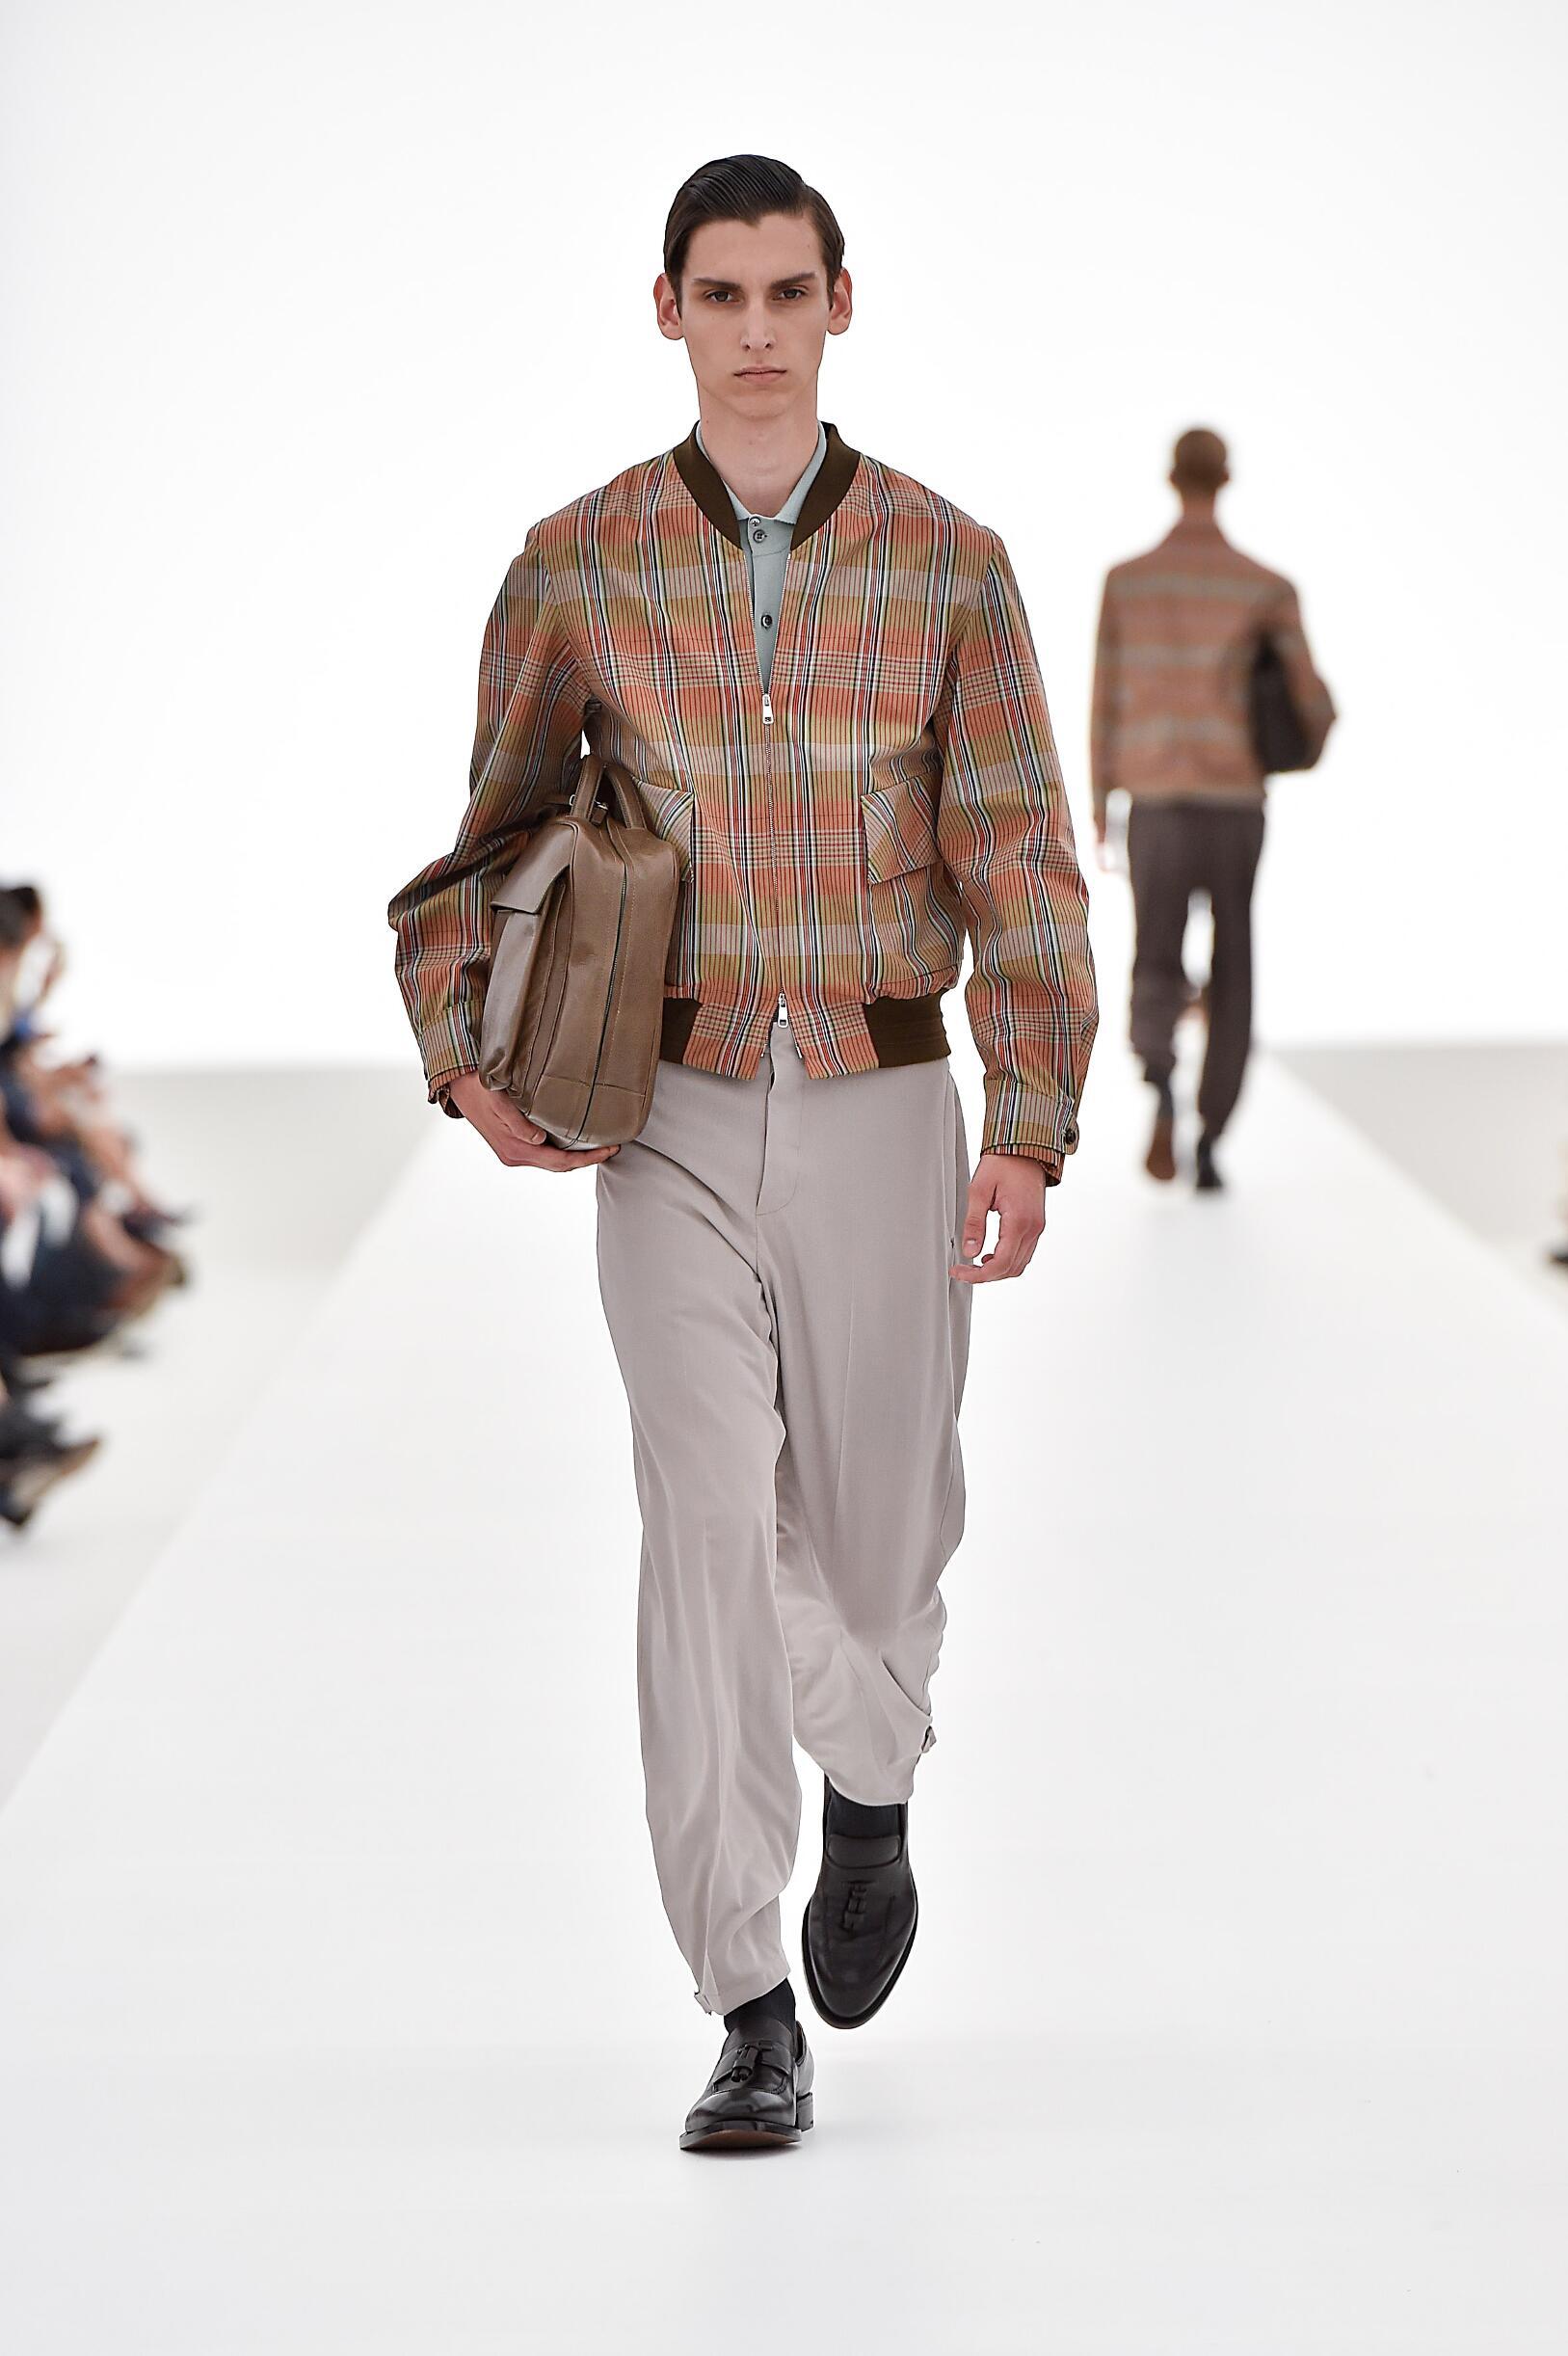 Spring Ermenegildo Zegna Couture Collection Fashion Men Model